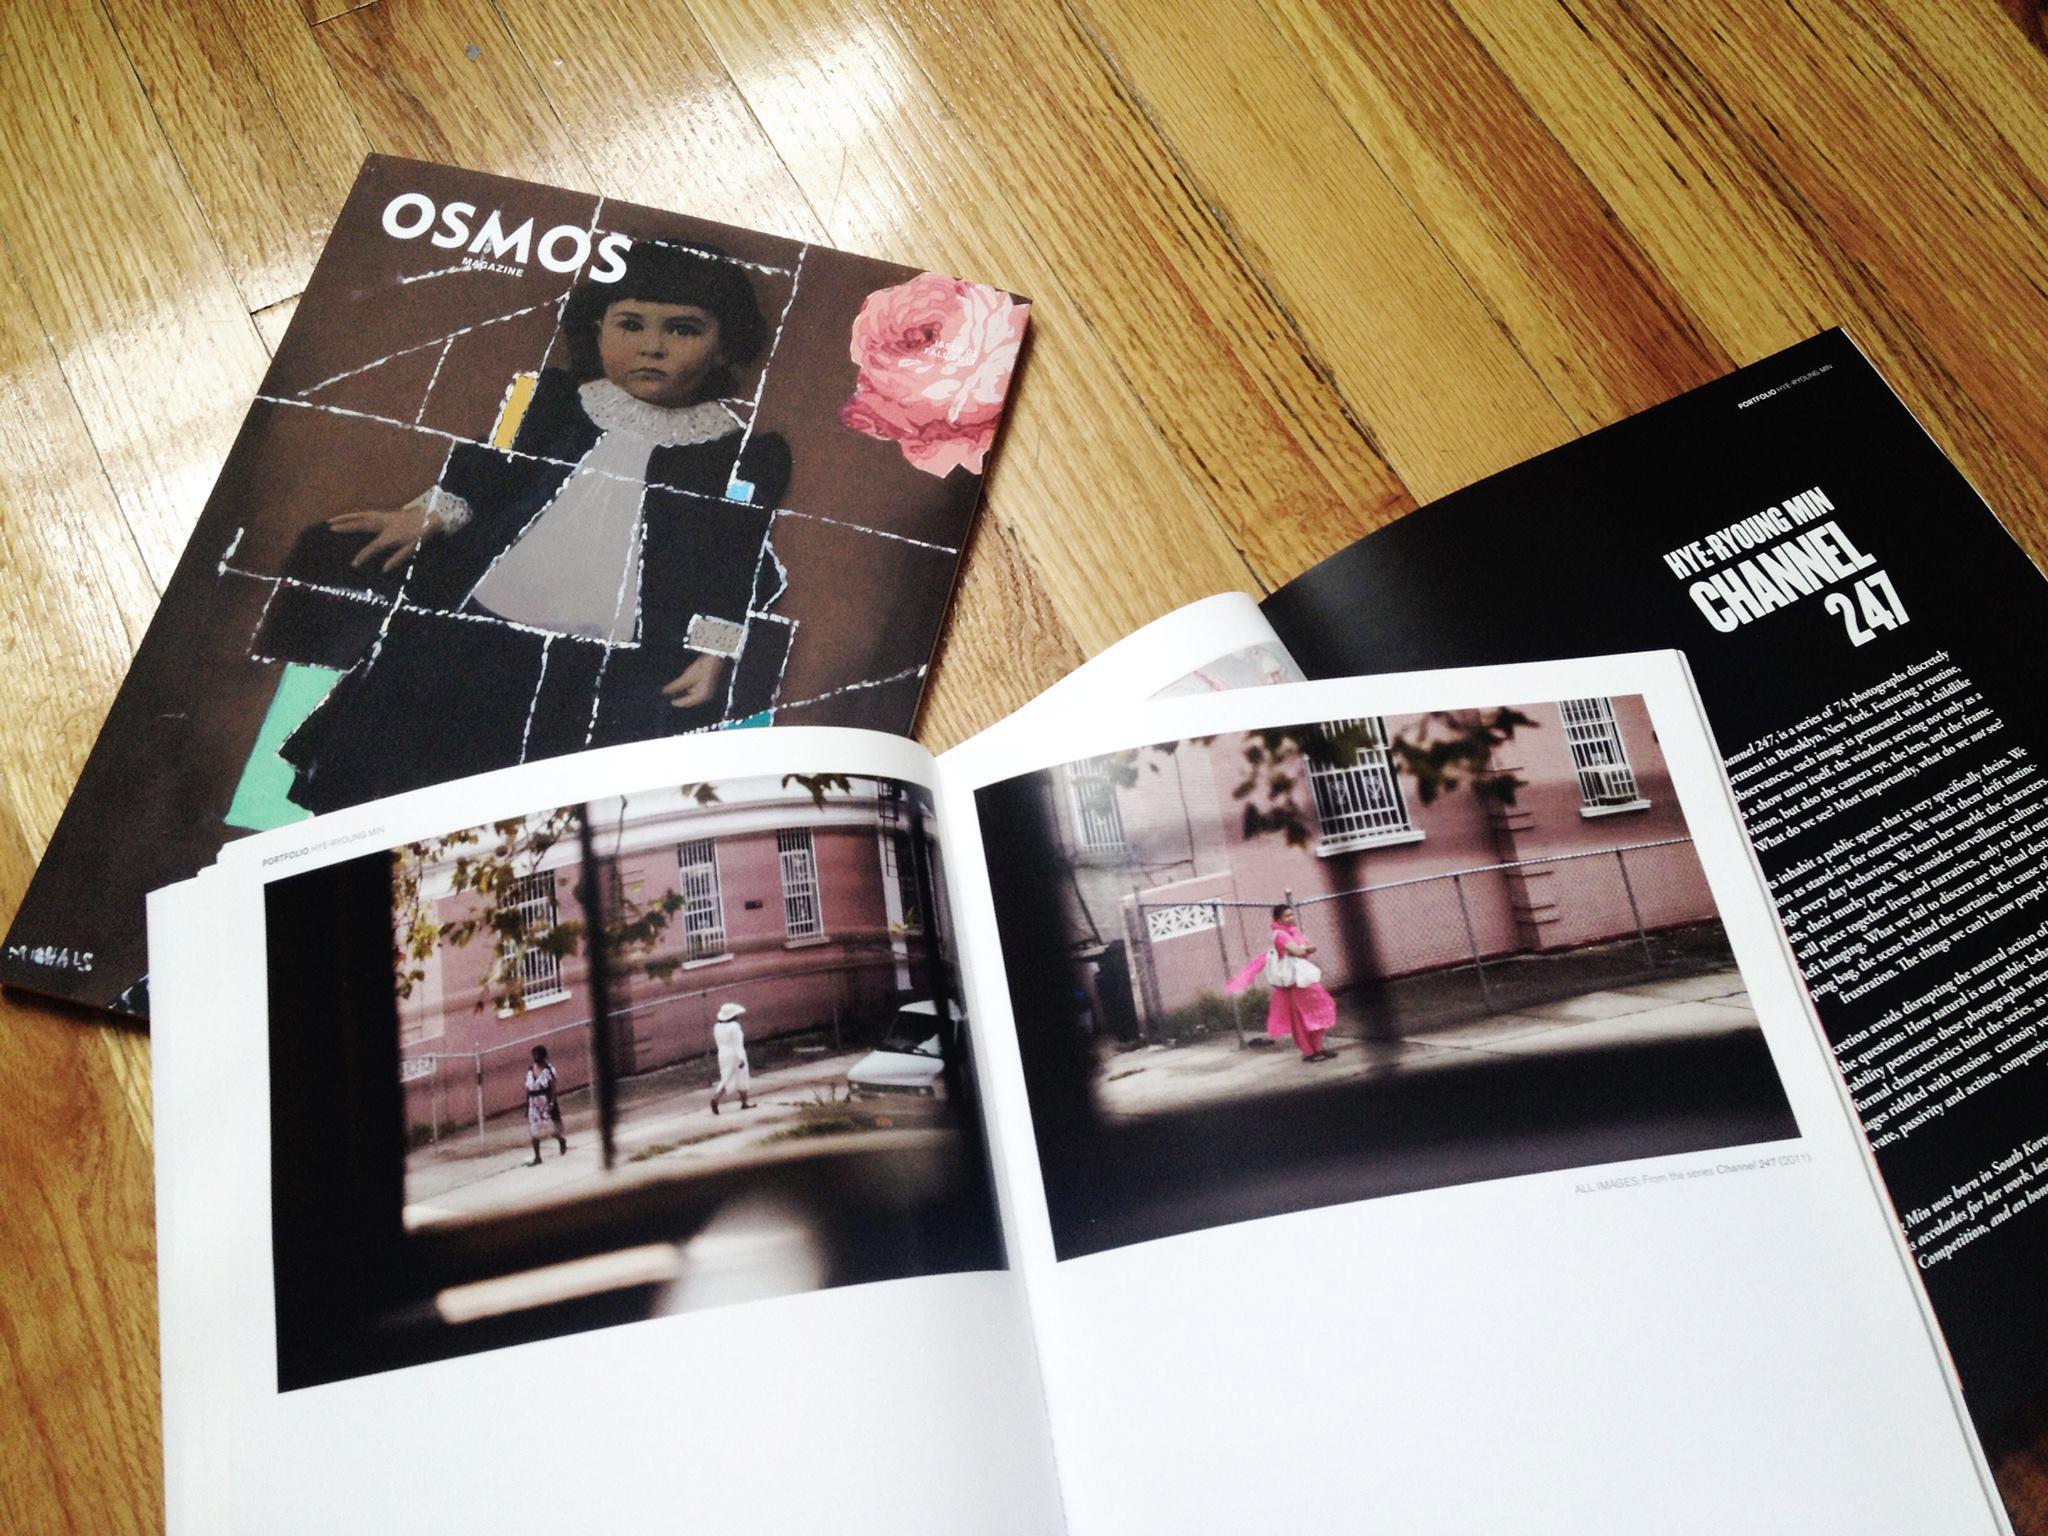 OSMOS_Channel247_Hye-Ryoung_Min.jpg